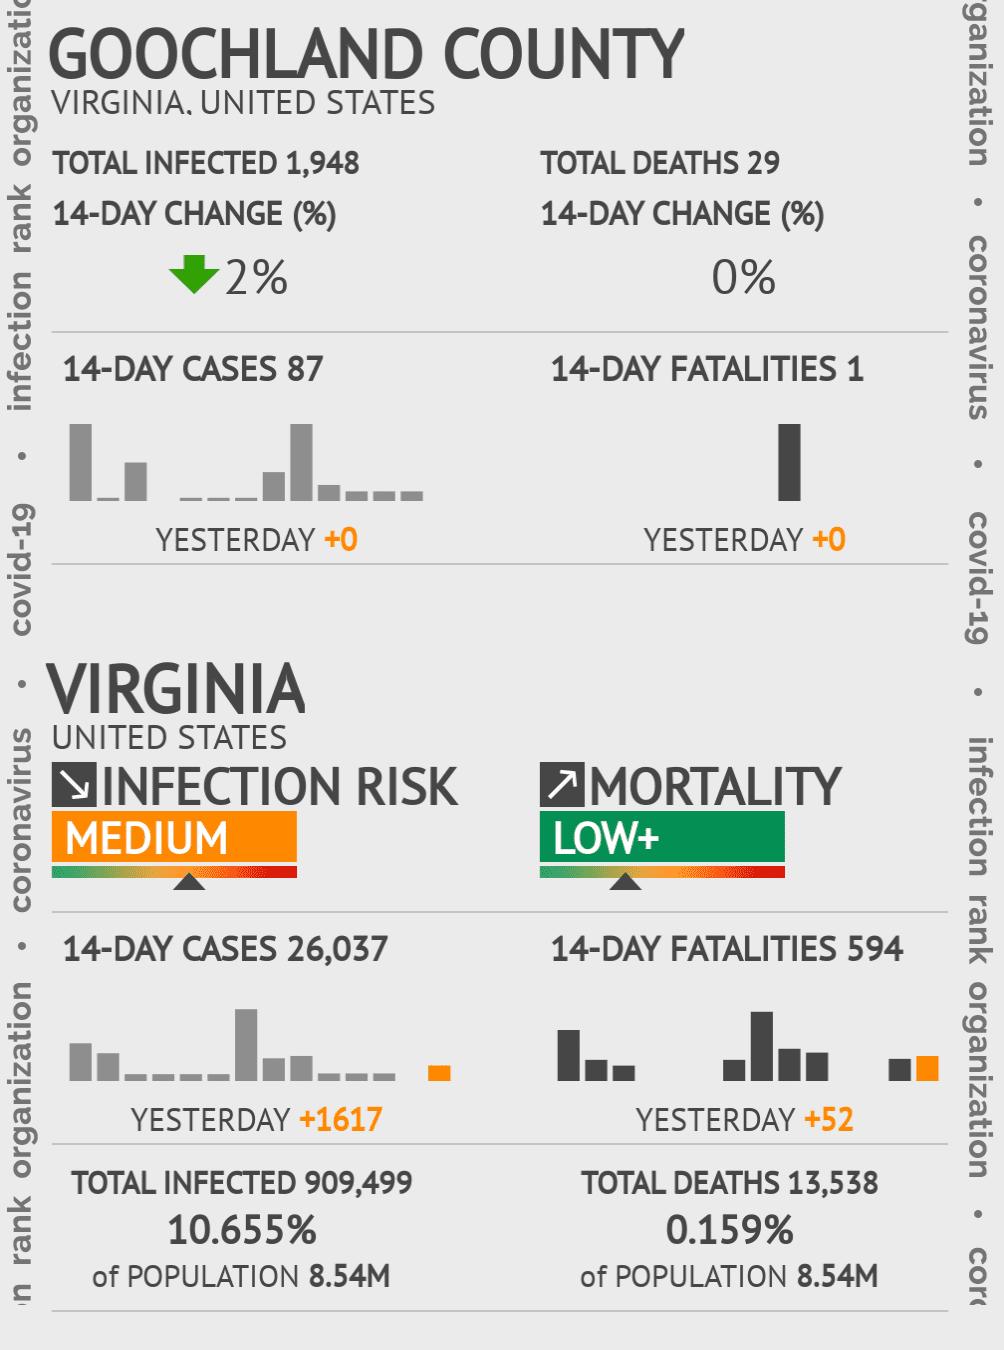 Goochland County Coronavirus Covid-19 Risk of Infection on July 24, 2021